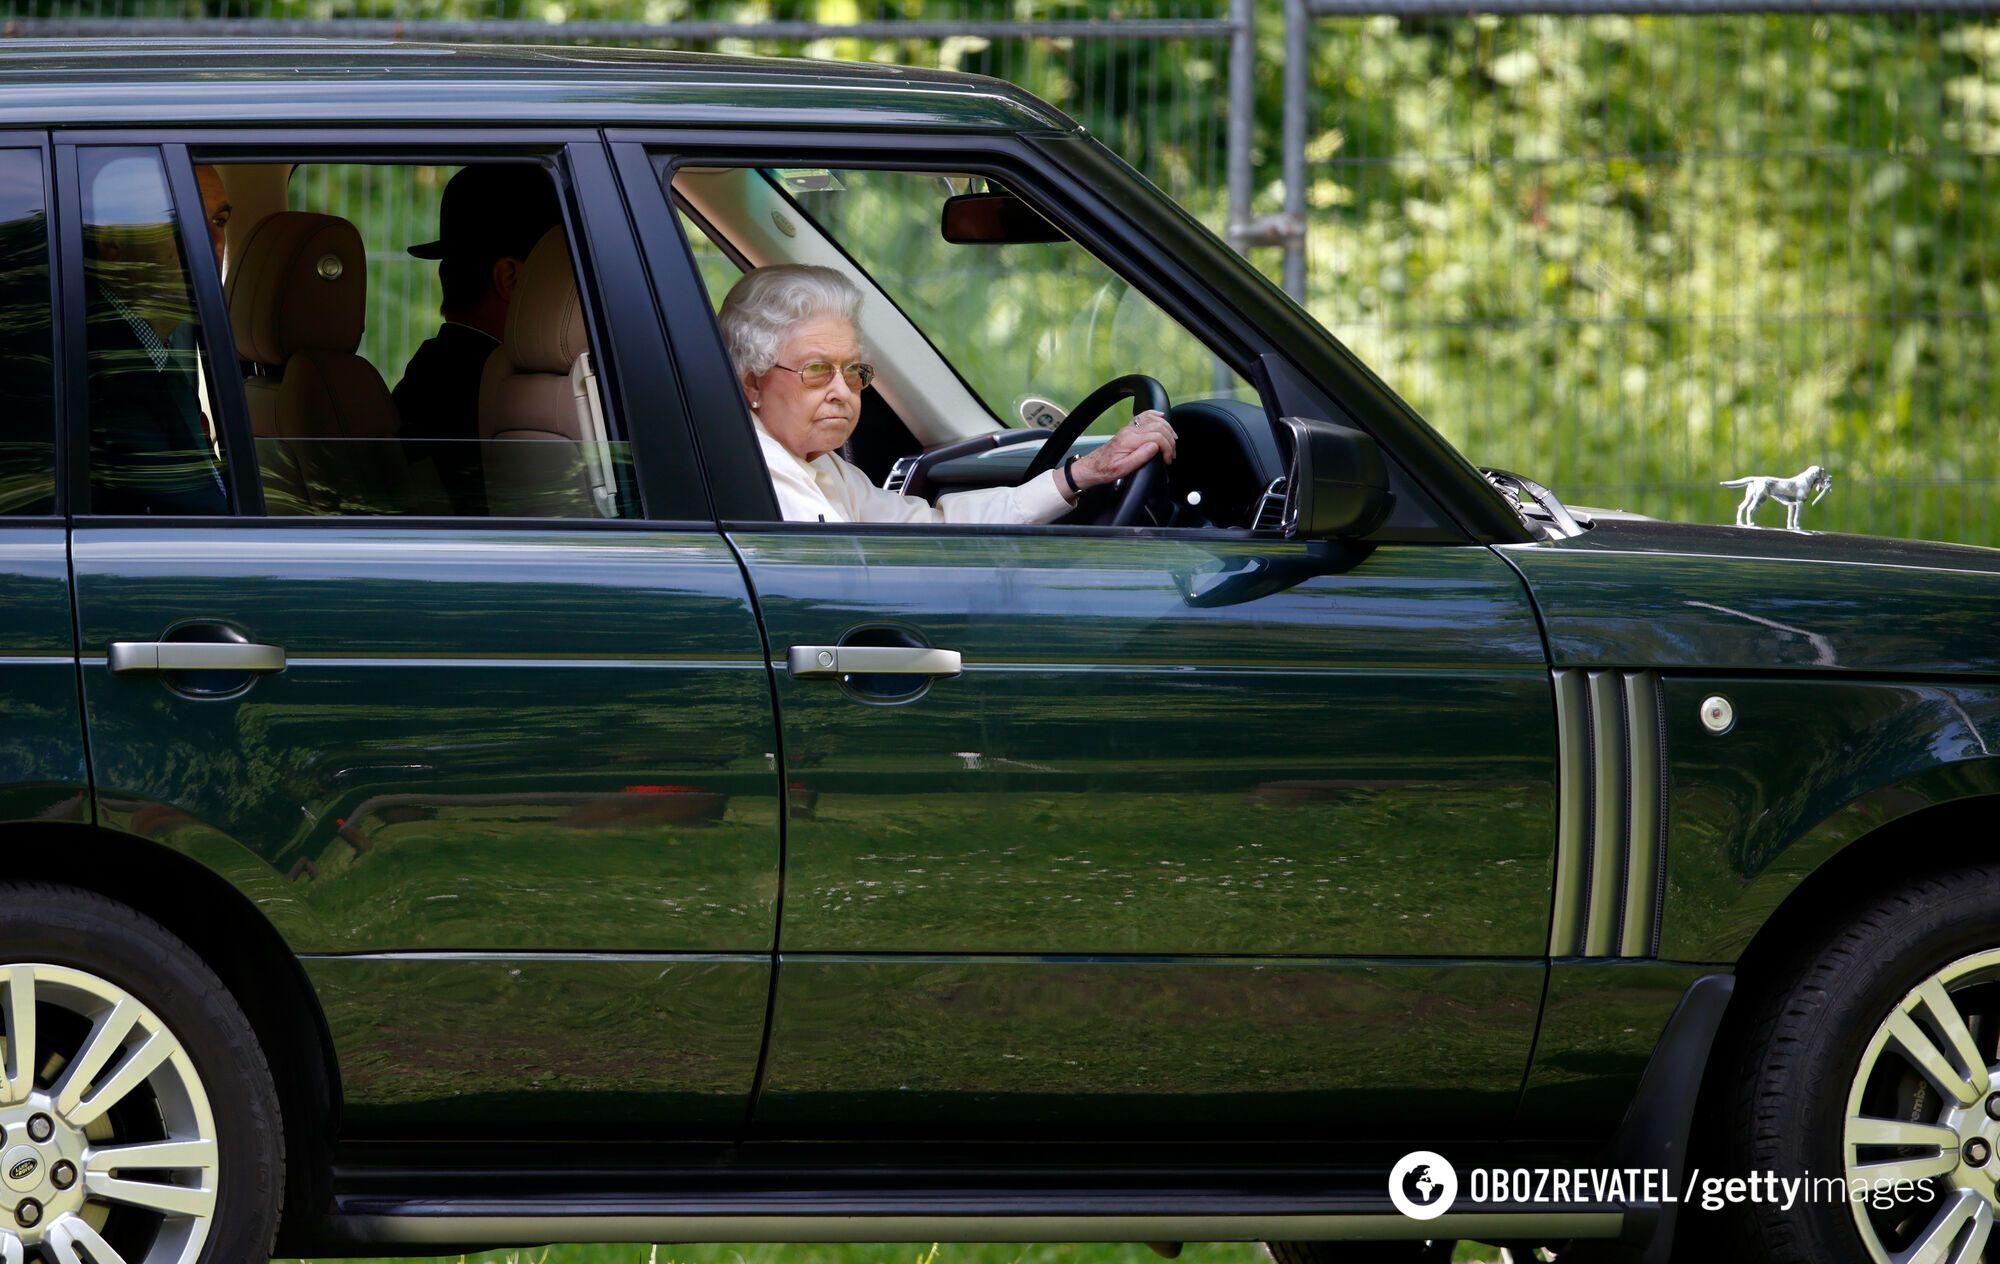 Королева любит водить авто.